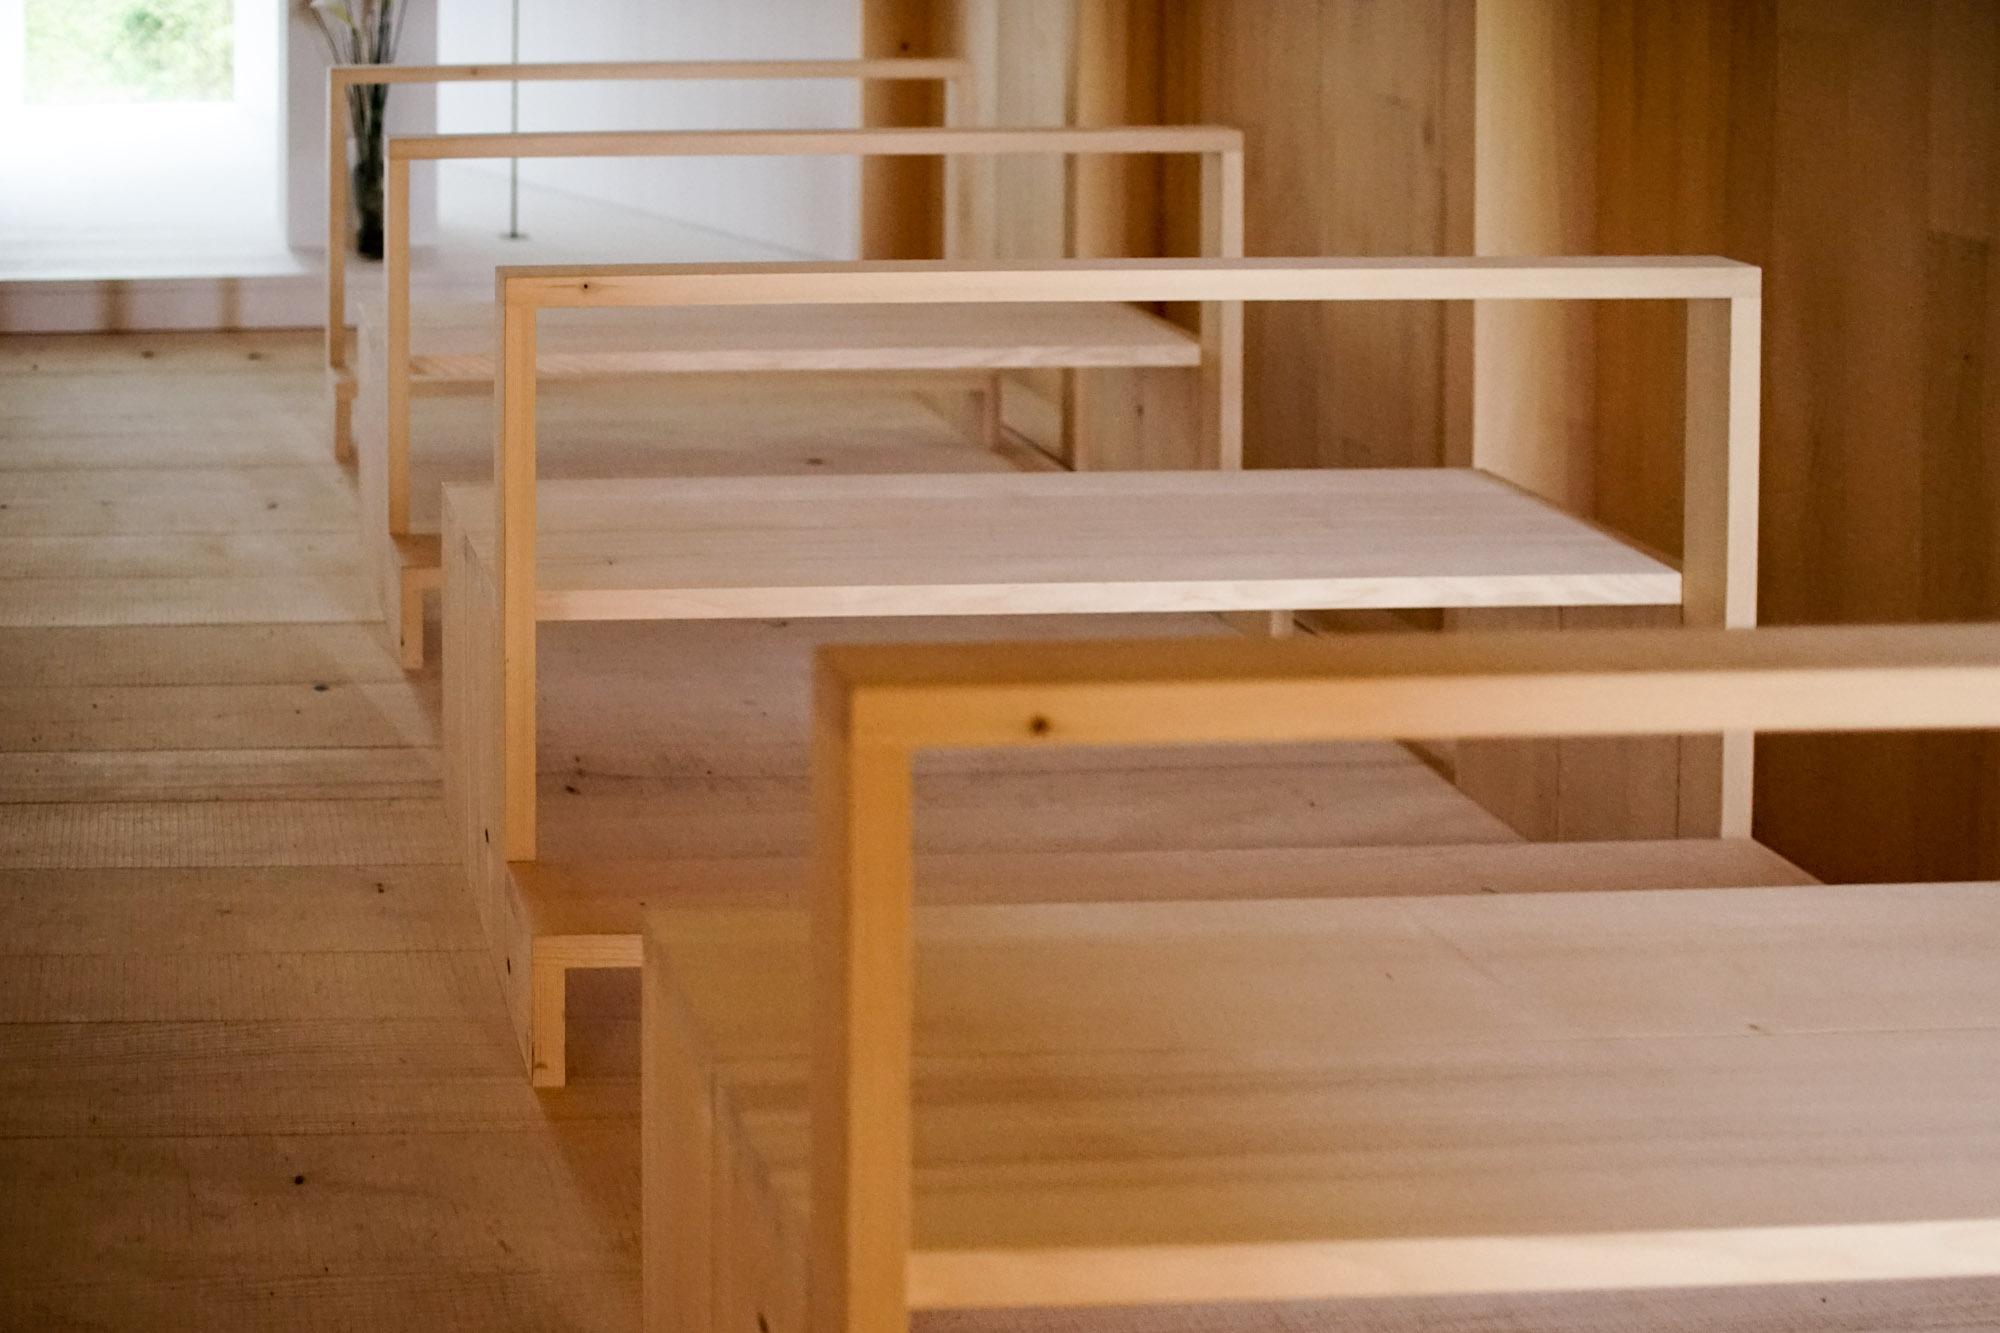 salgenreute-chapel-bernardo-bader-photo-jean-nicolas-lechat-urbantyper-banc